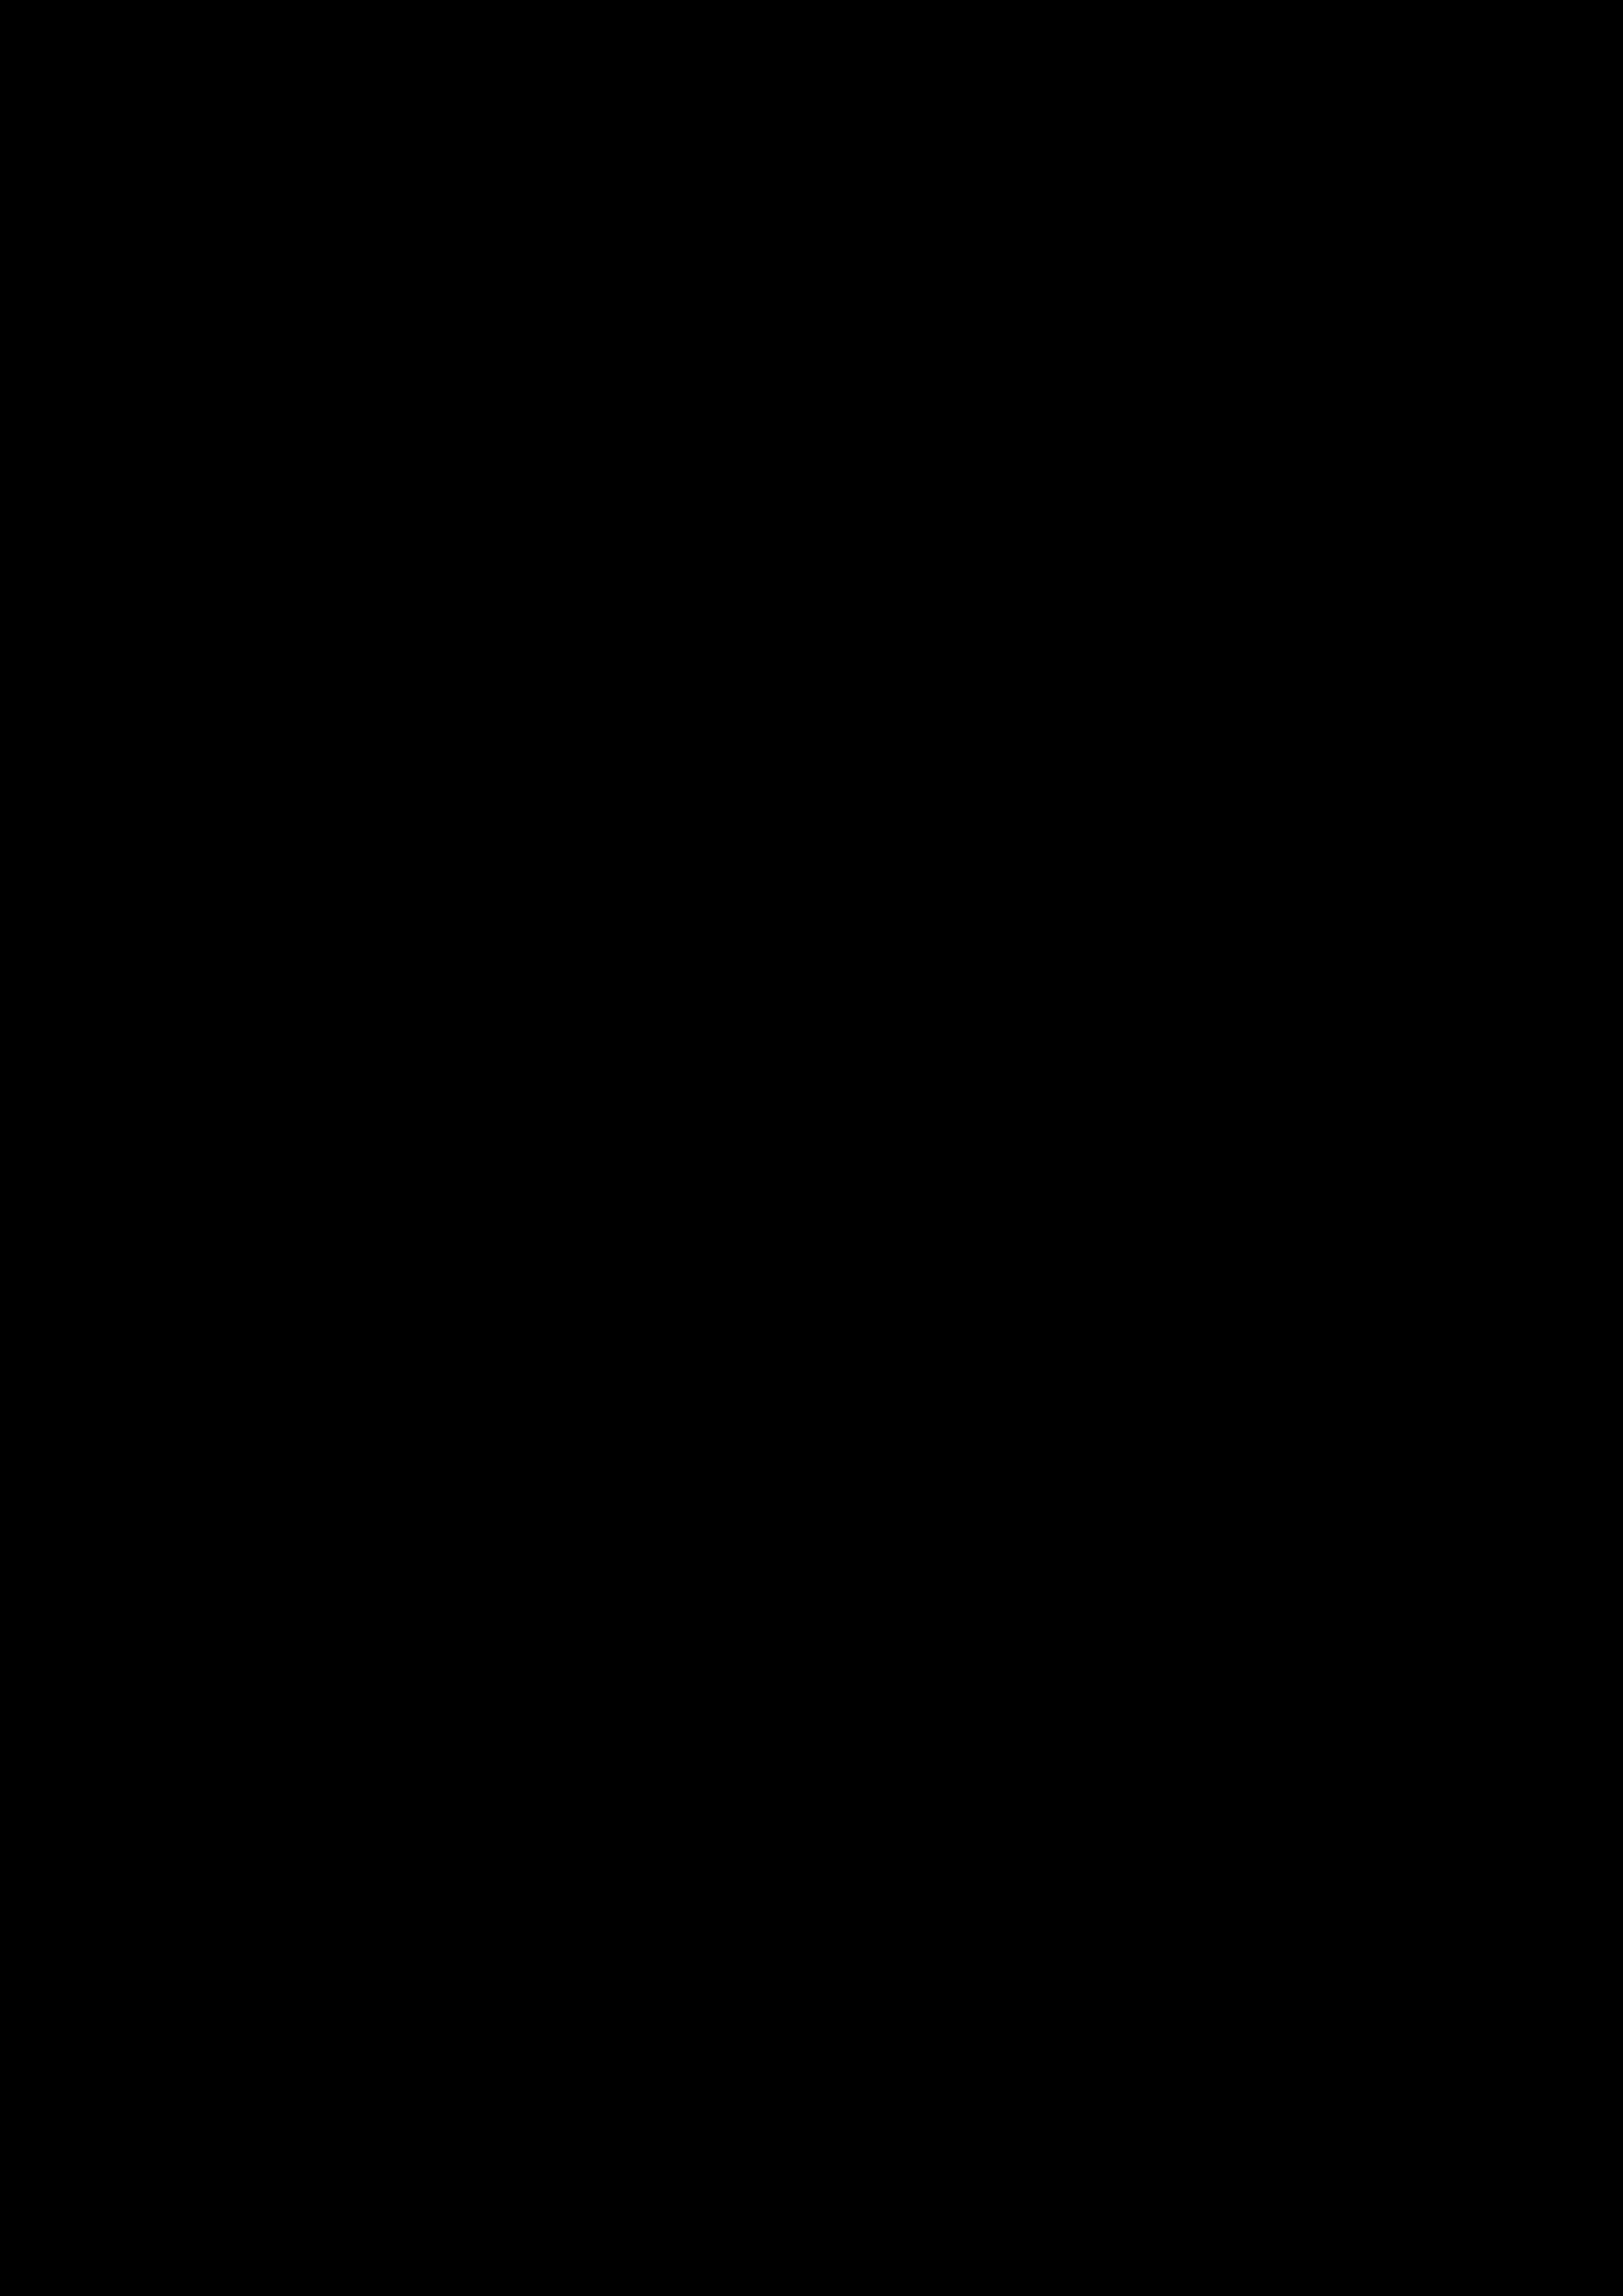 microsoft.ace.oledb.12.0 example xlsx